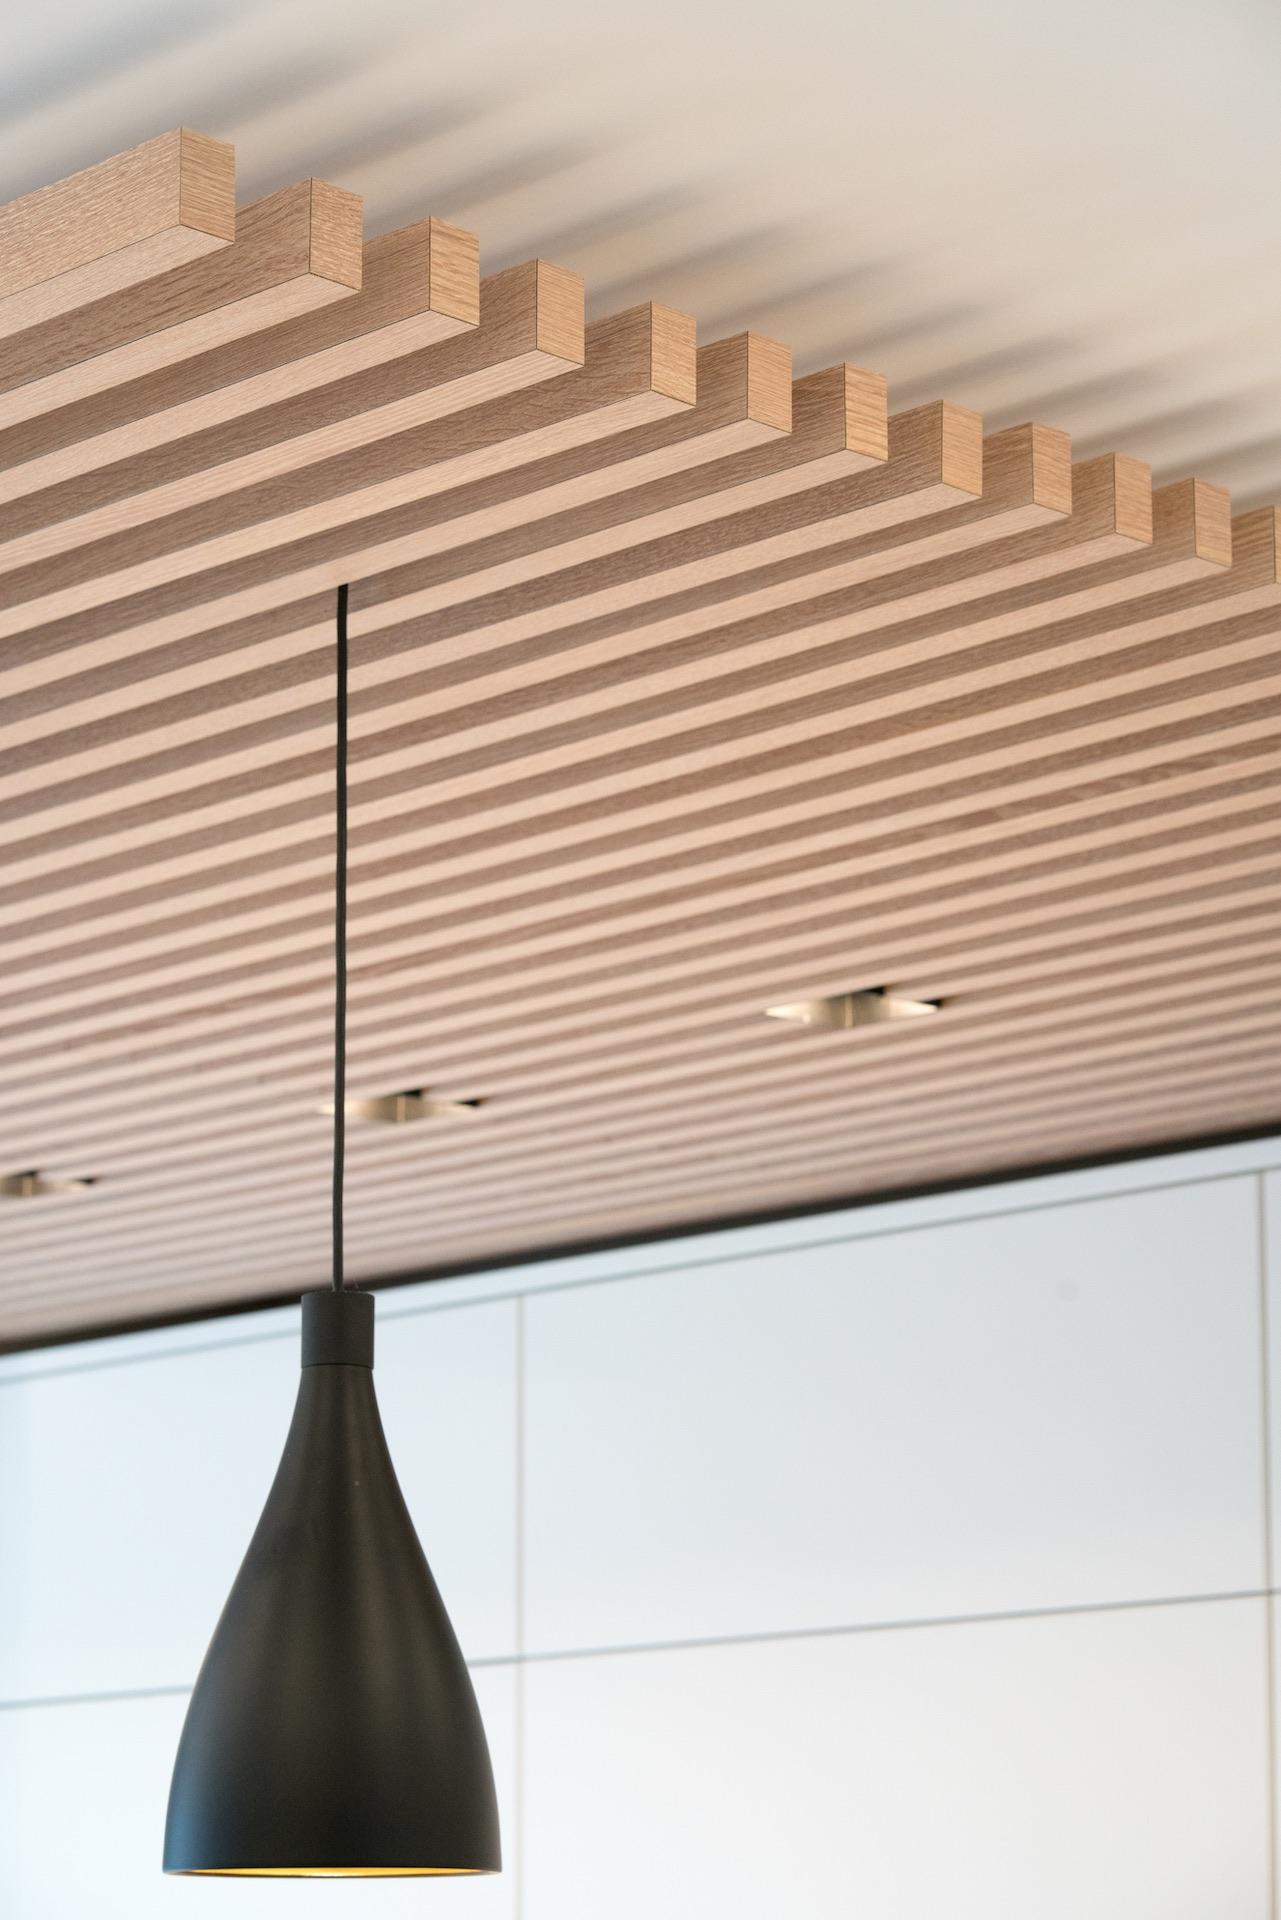 wood panels on ceiling